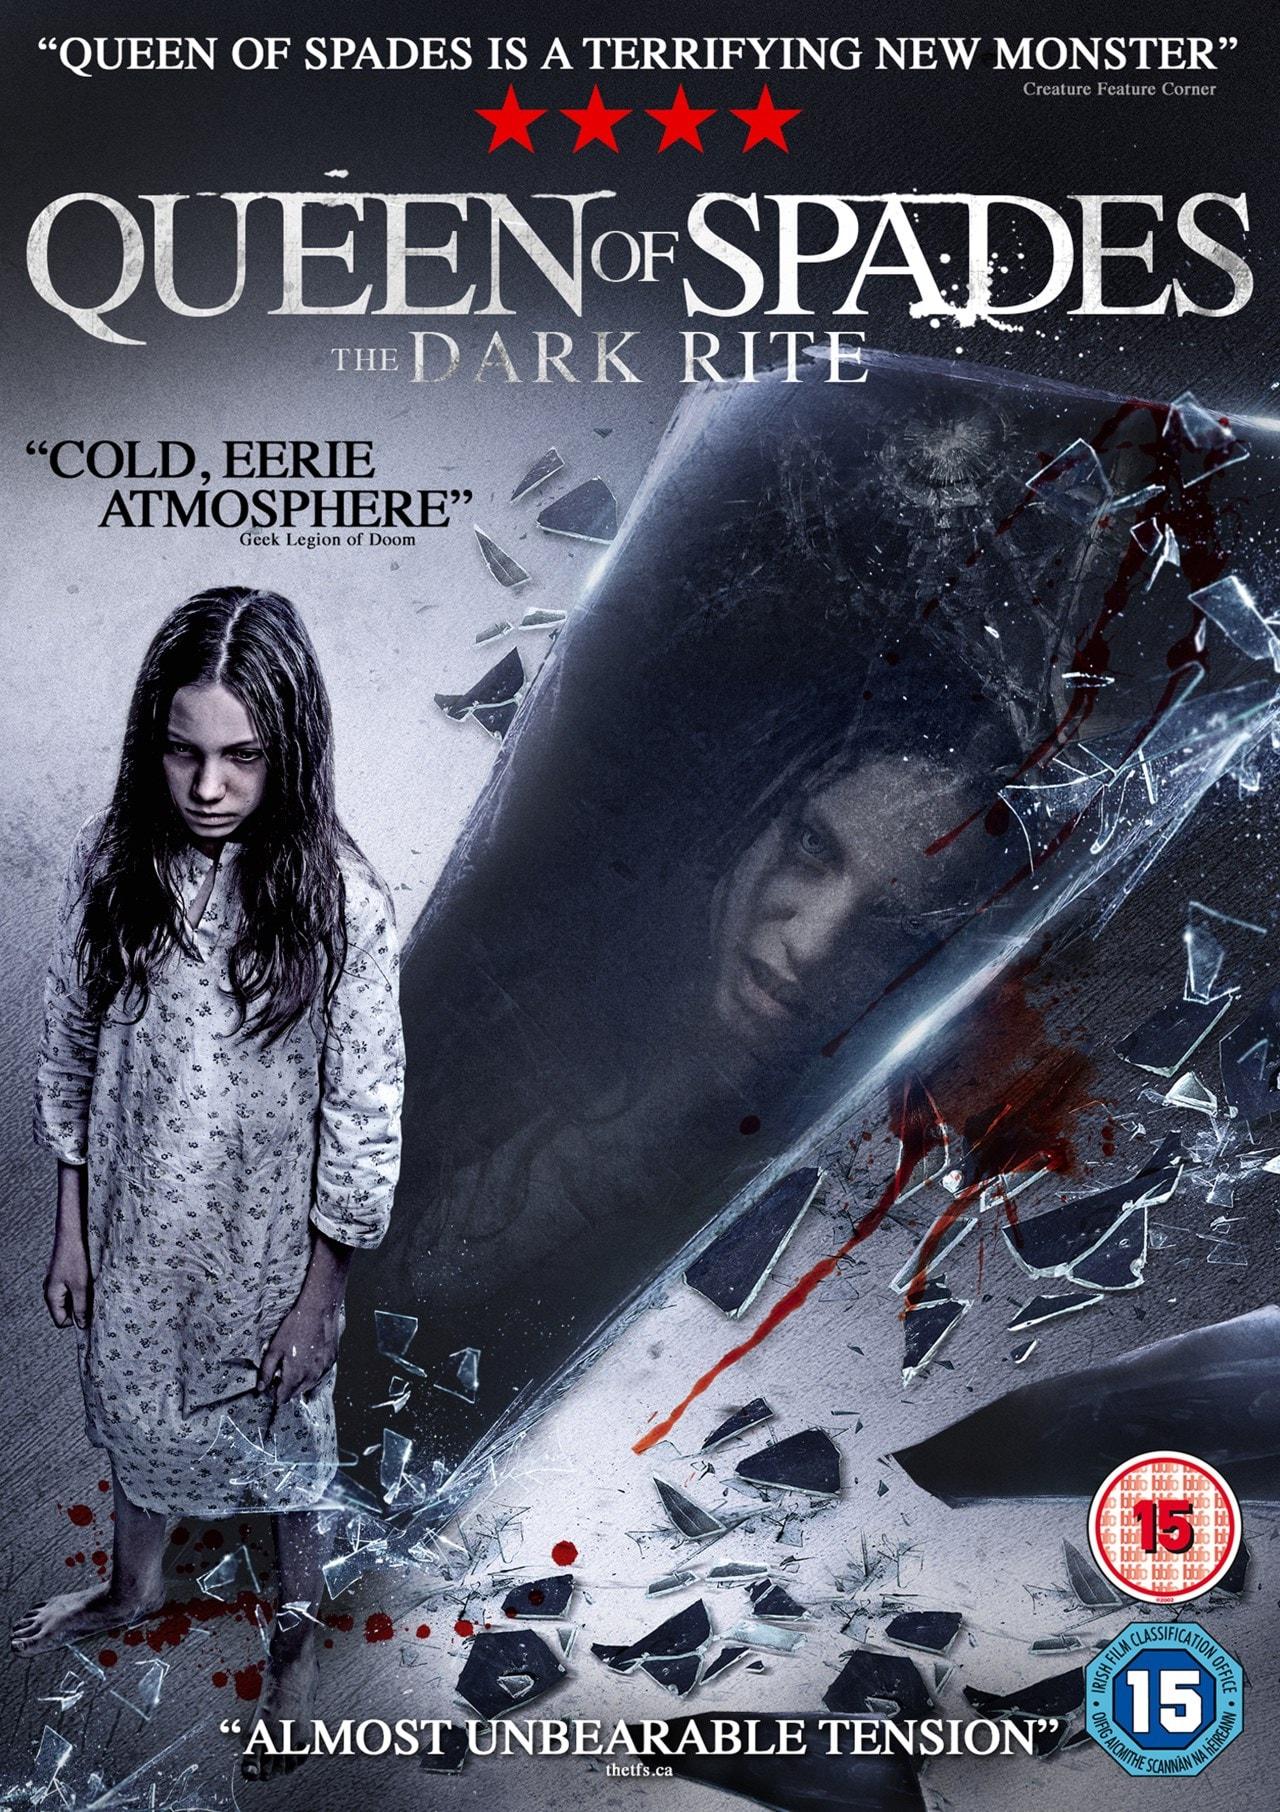 Queen of Spades - The Dark Rite - 1